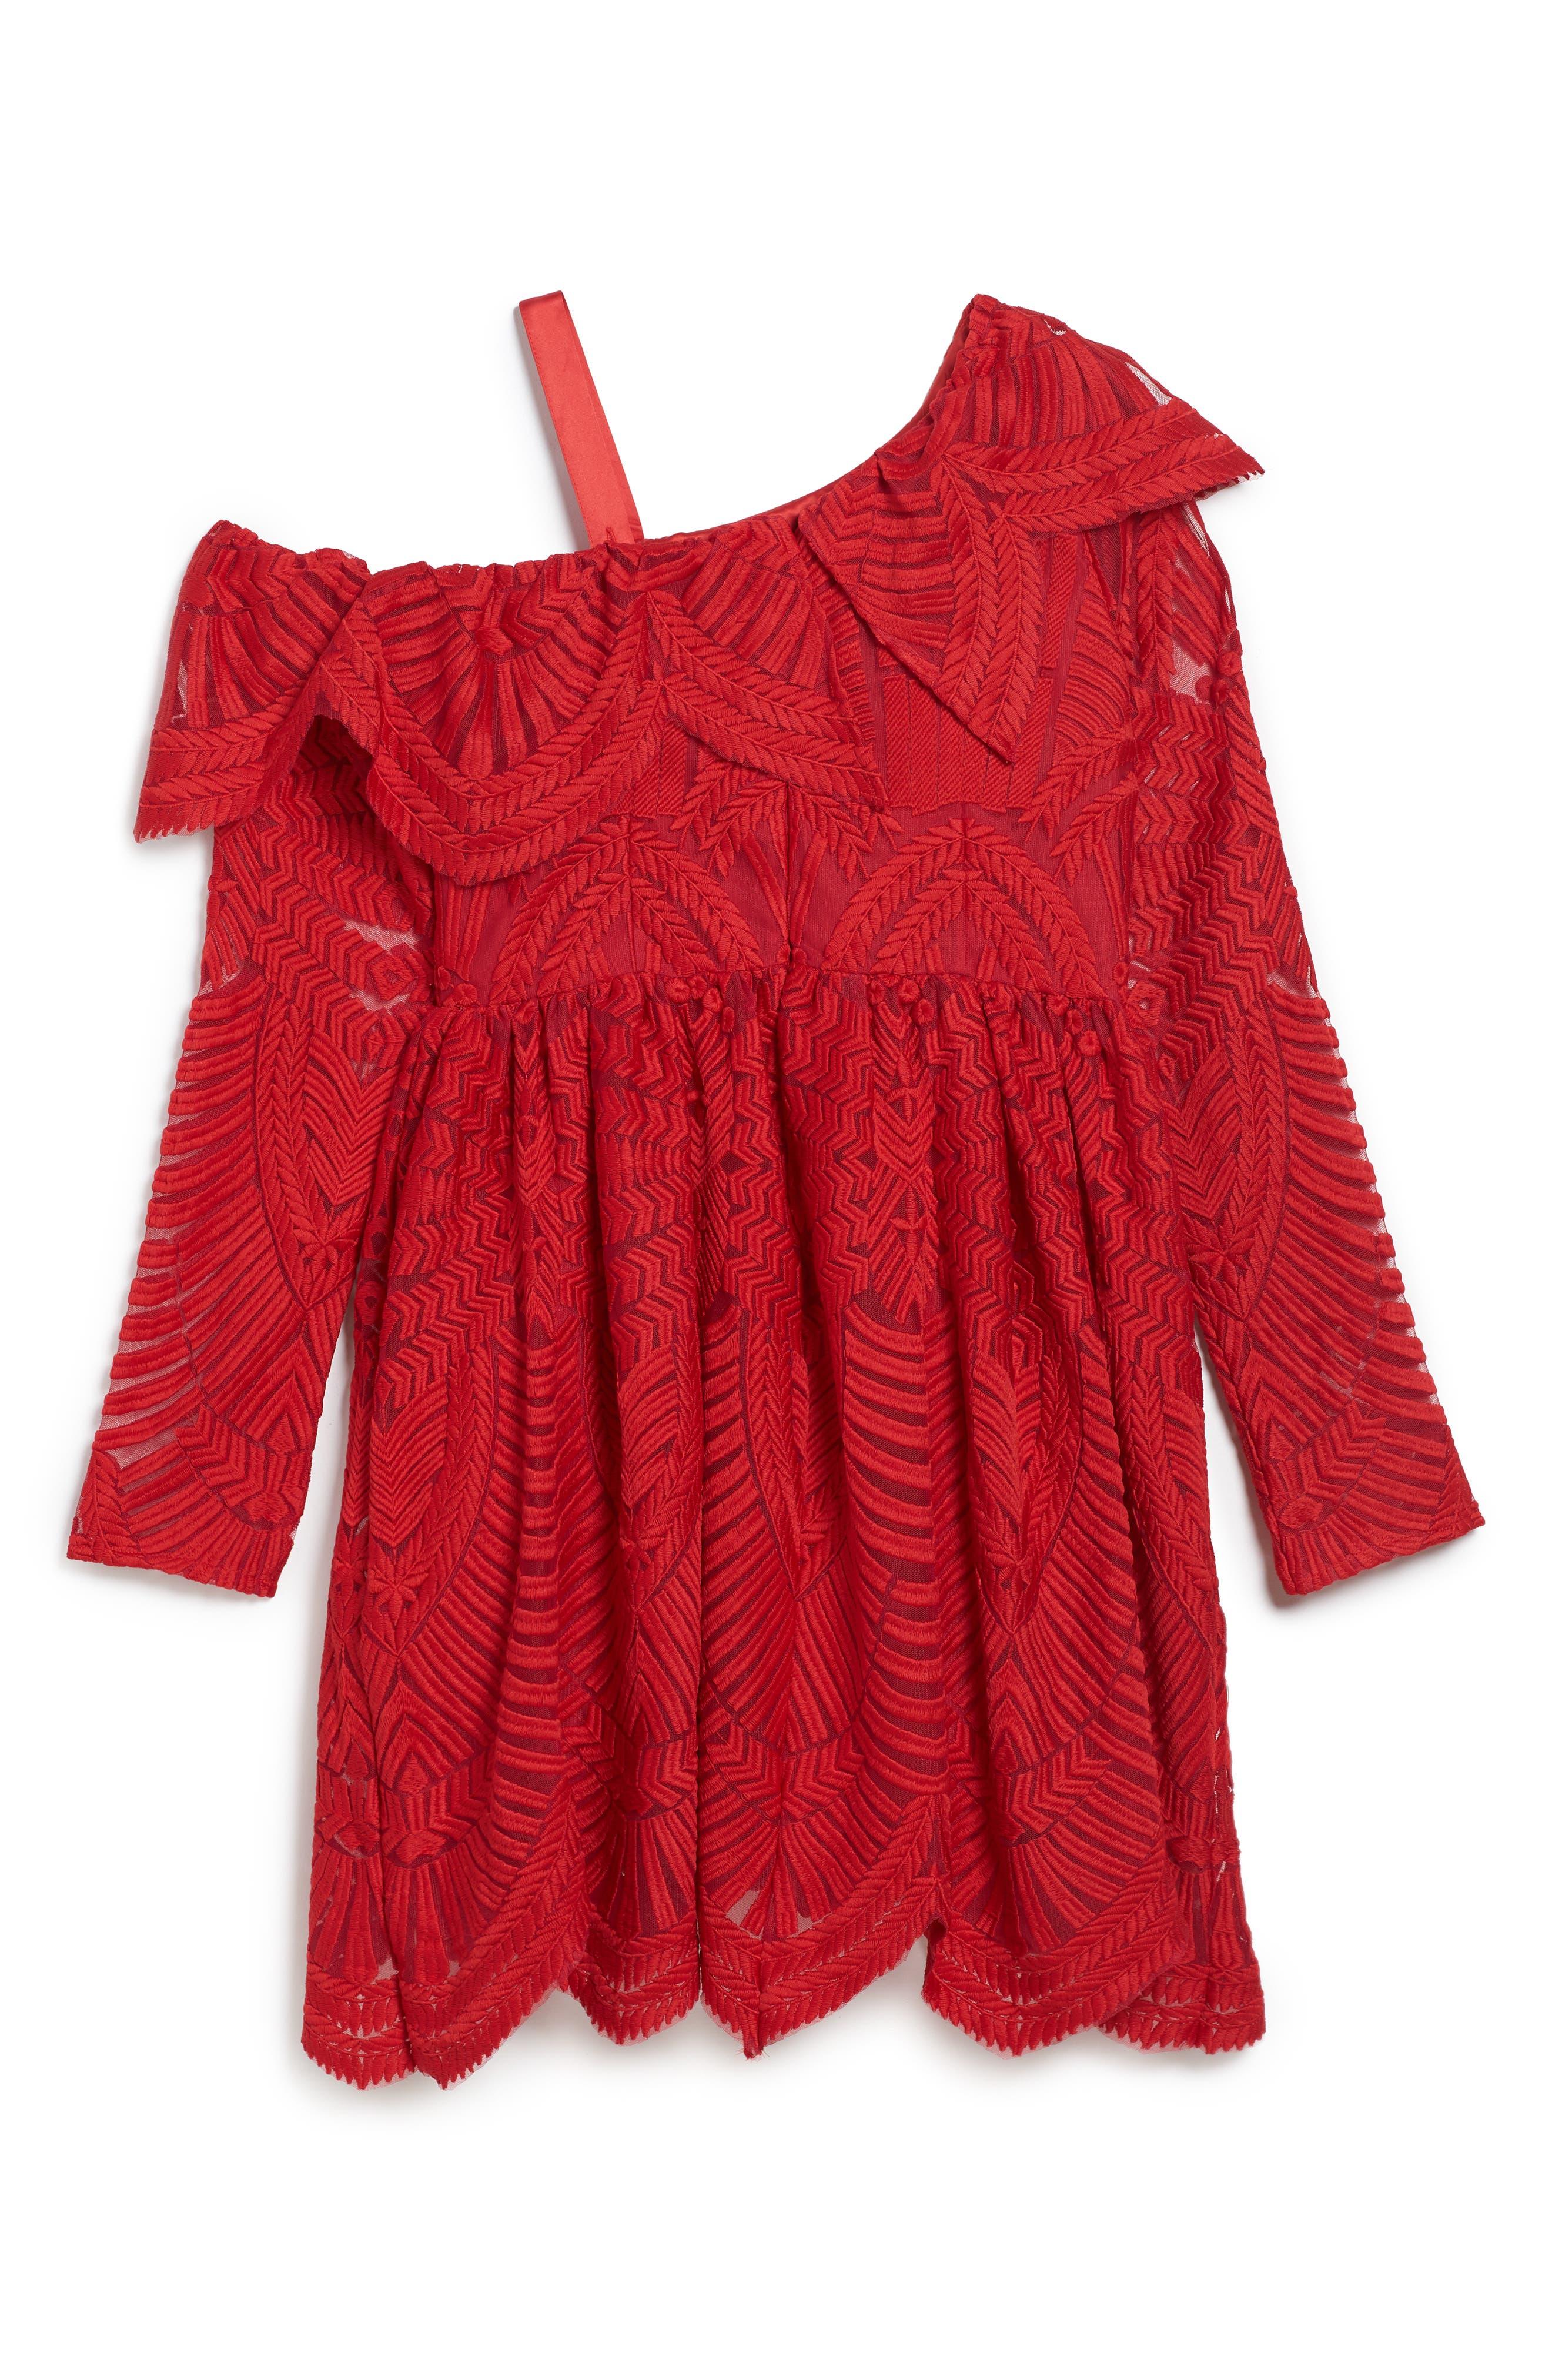 Sybil Lace Dress,                             Alternate thumbnail 2, color,                             600